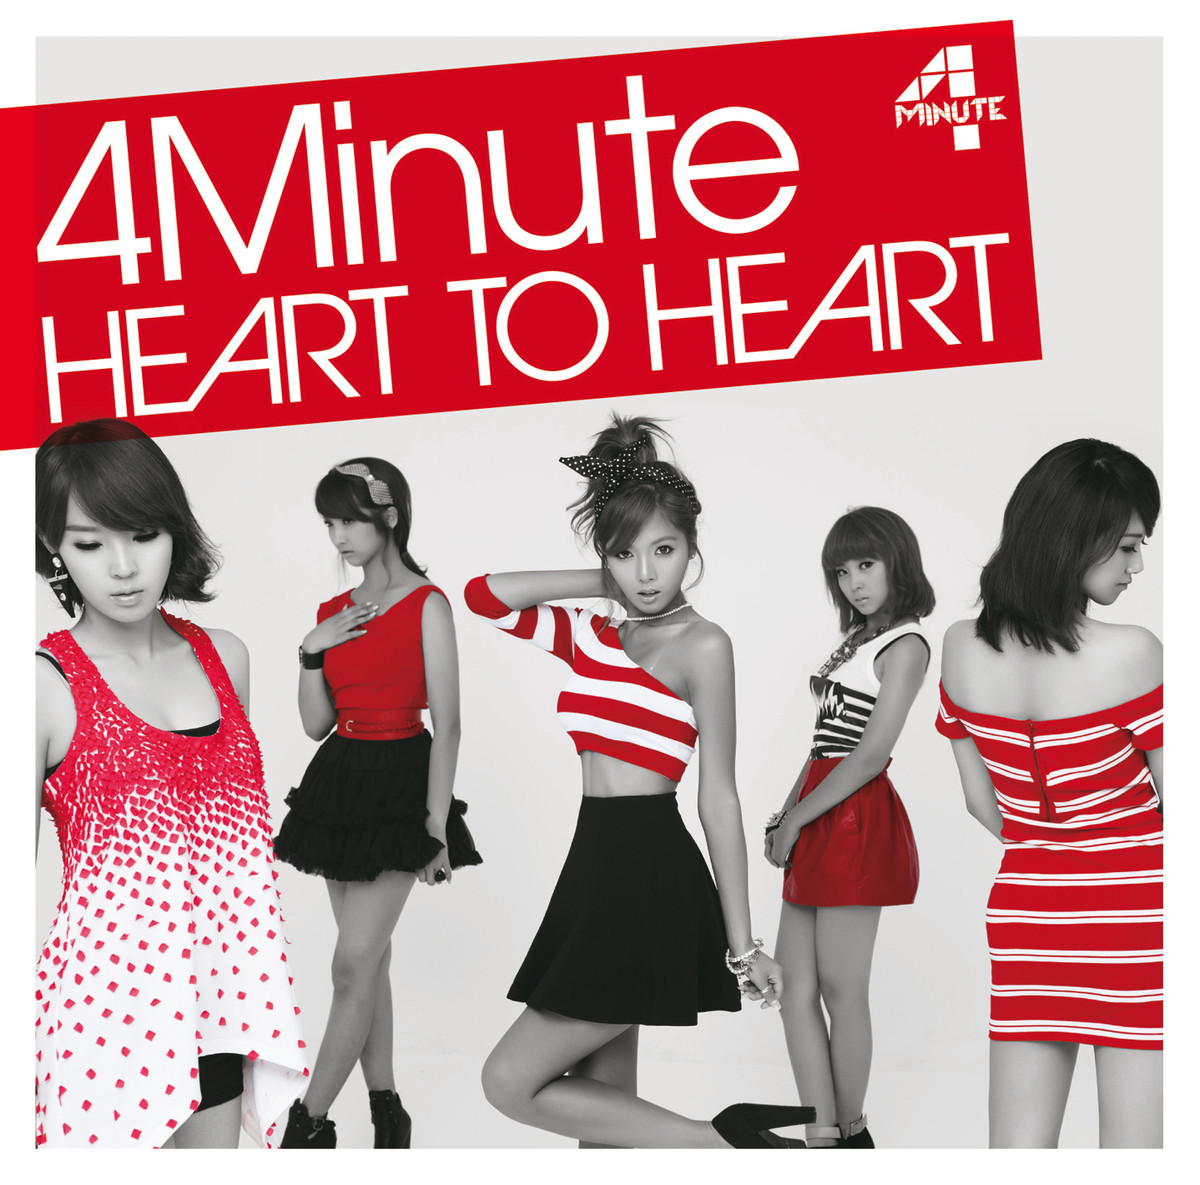 20170115.19.01 4Minute - HEART TO HEART (Type A) (DVD) (JPOP.ru) cover 3.jpg